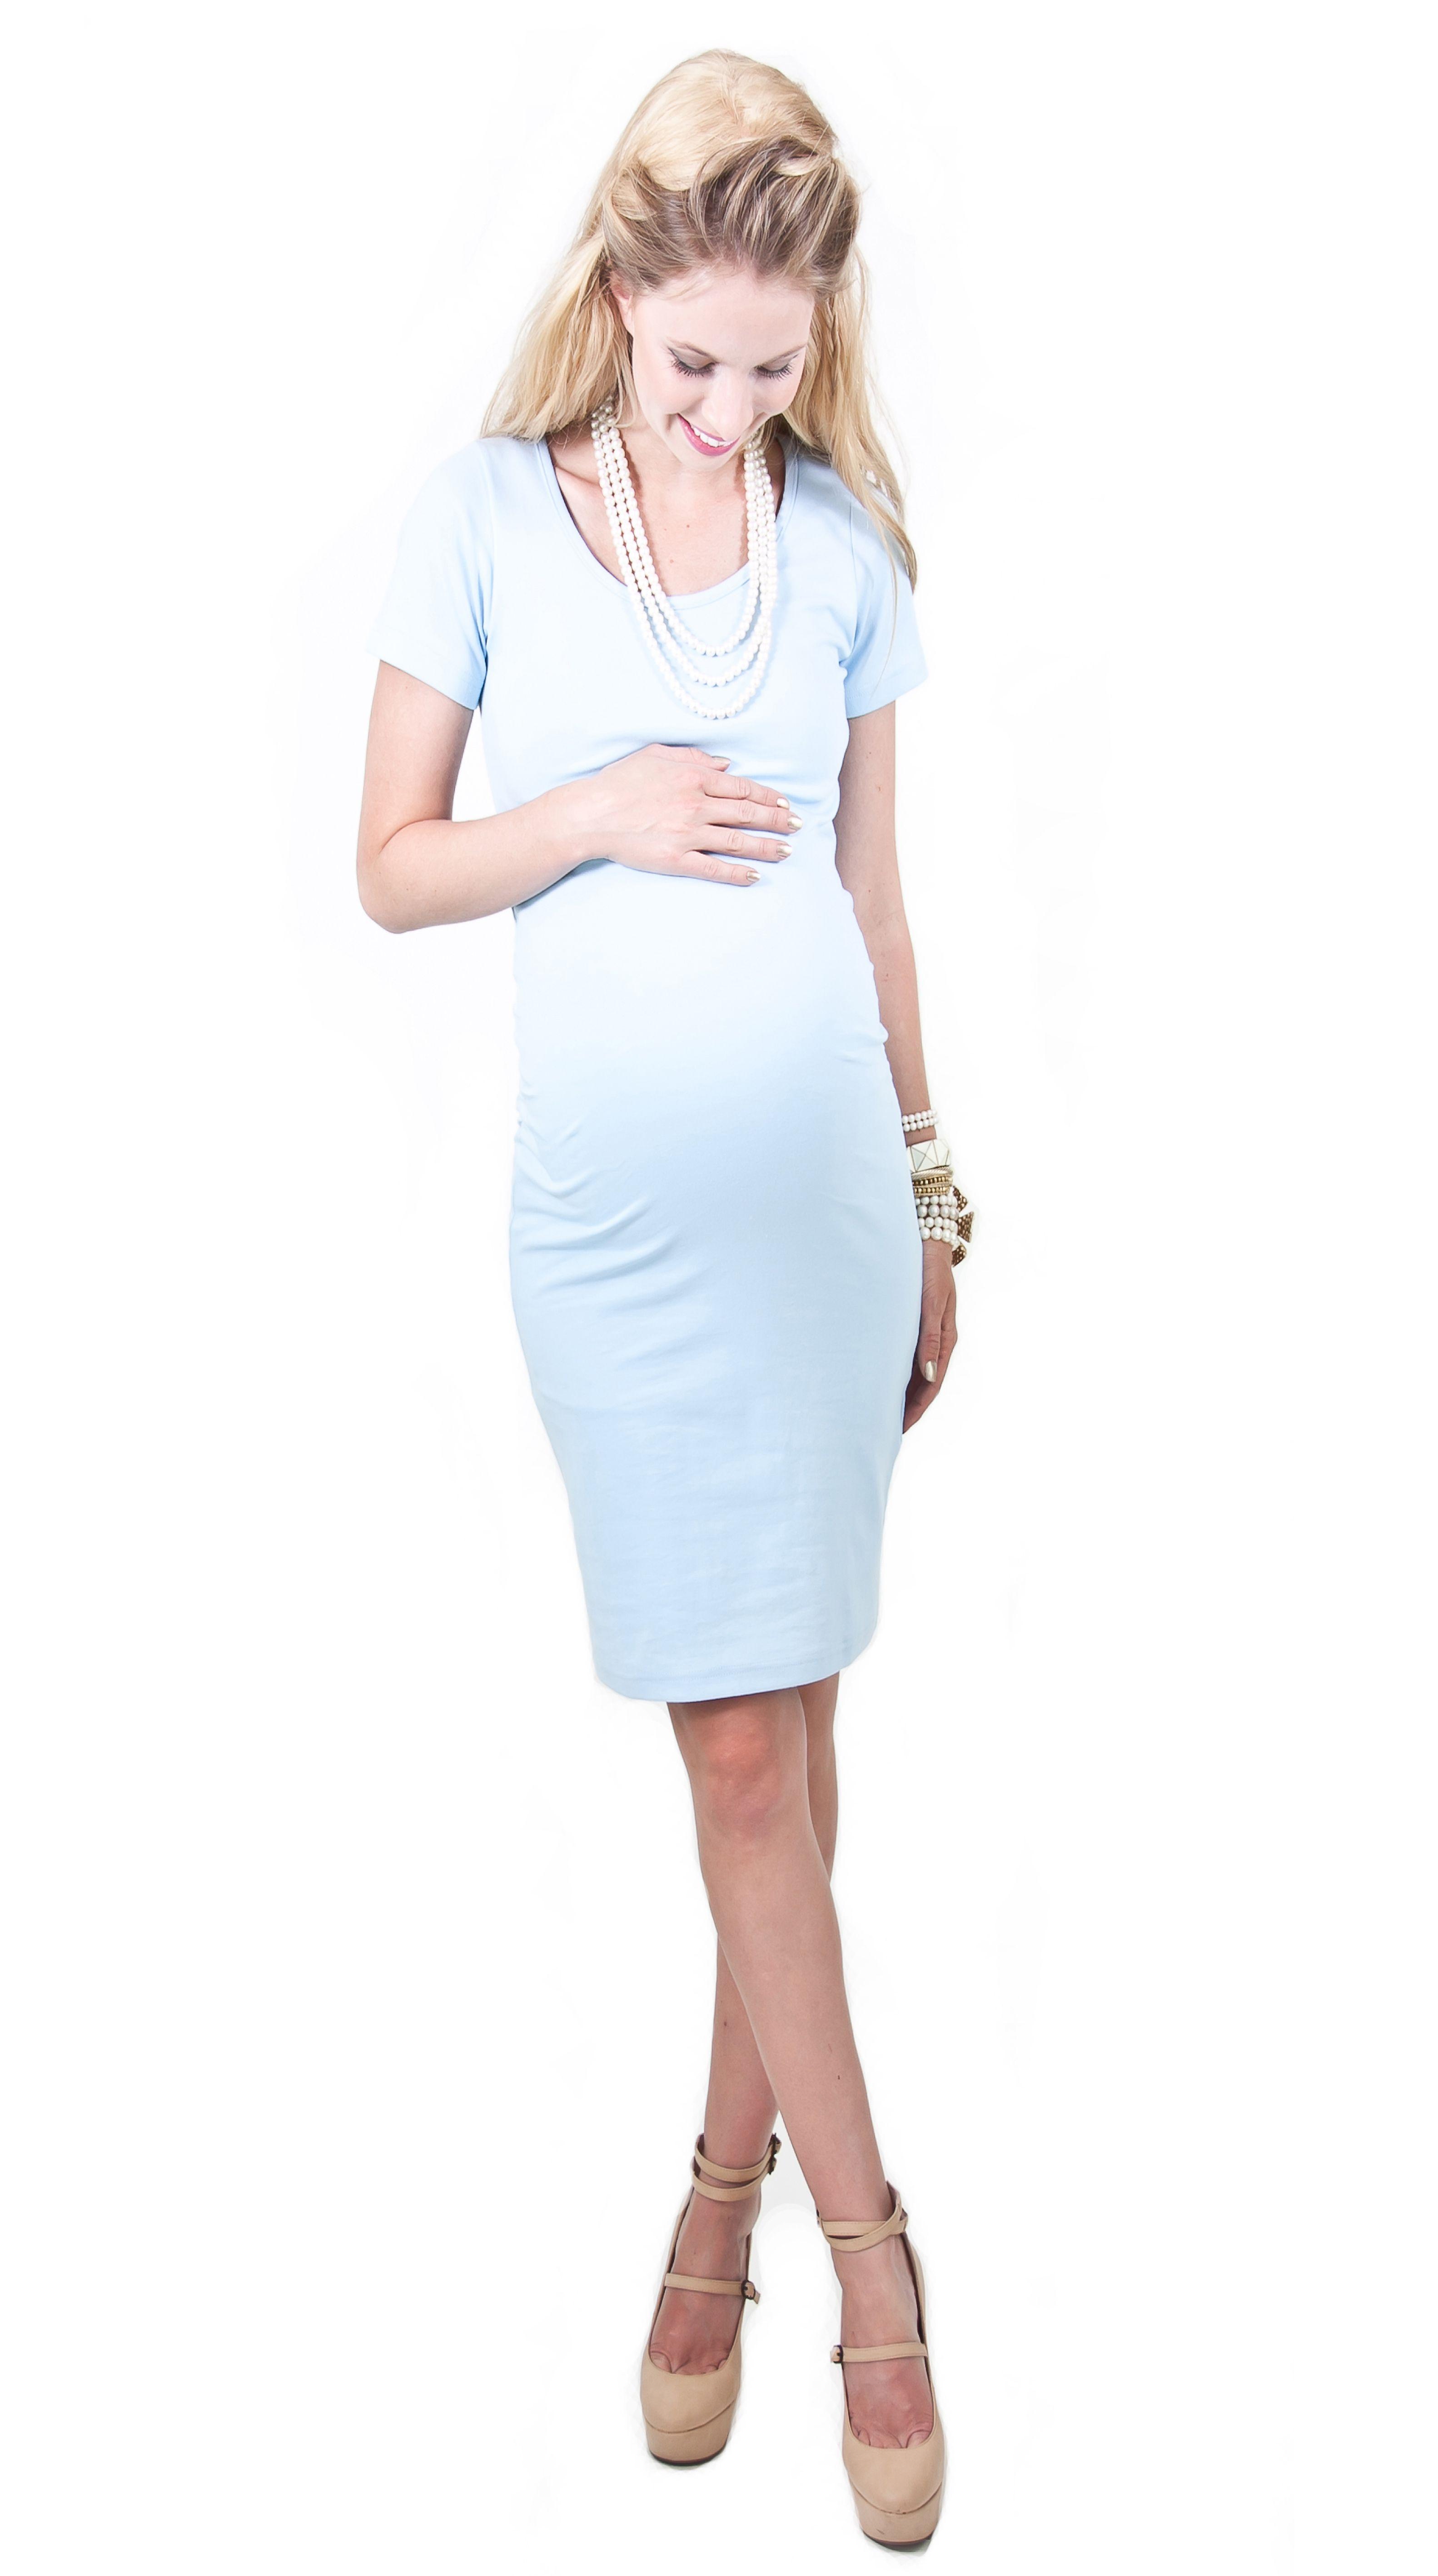 Baby shower dress sky blue madeleine maternity preston baby shower dress sky blue madeleine maternity ombrellifo Images